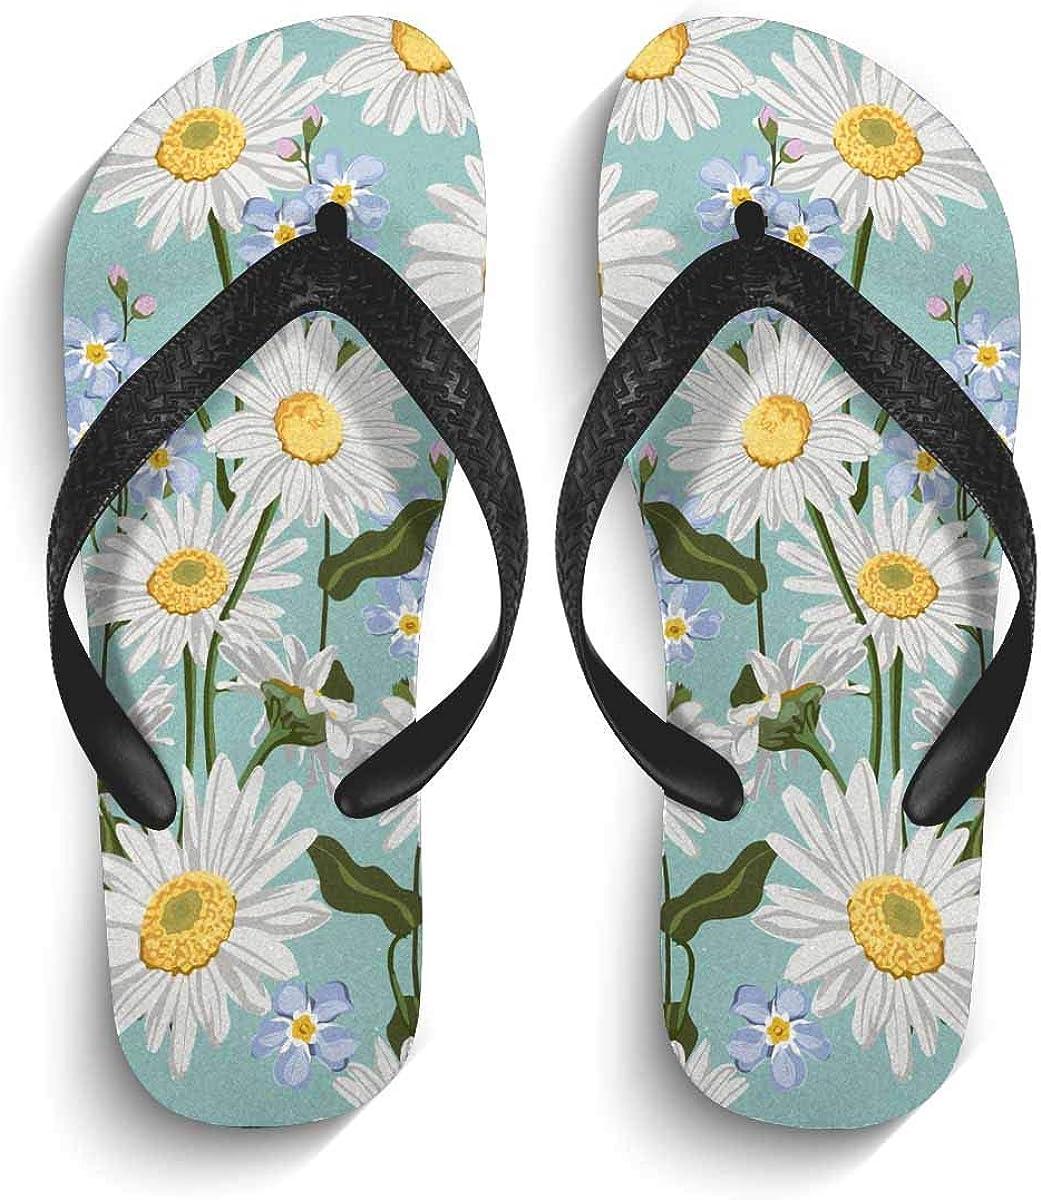 INTERESTPRINT Men's Non-Slip Flip Flops Cat or Dog Paw Animal Footprint and Bones Thongs Sandals for Beach Lounging Home